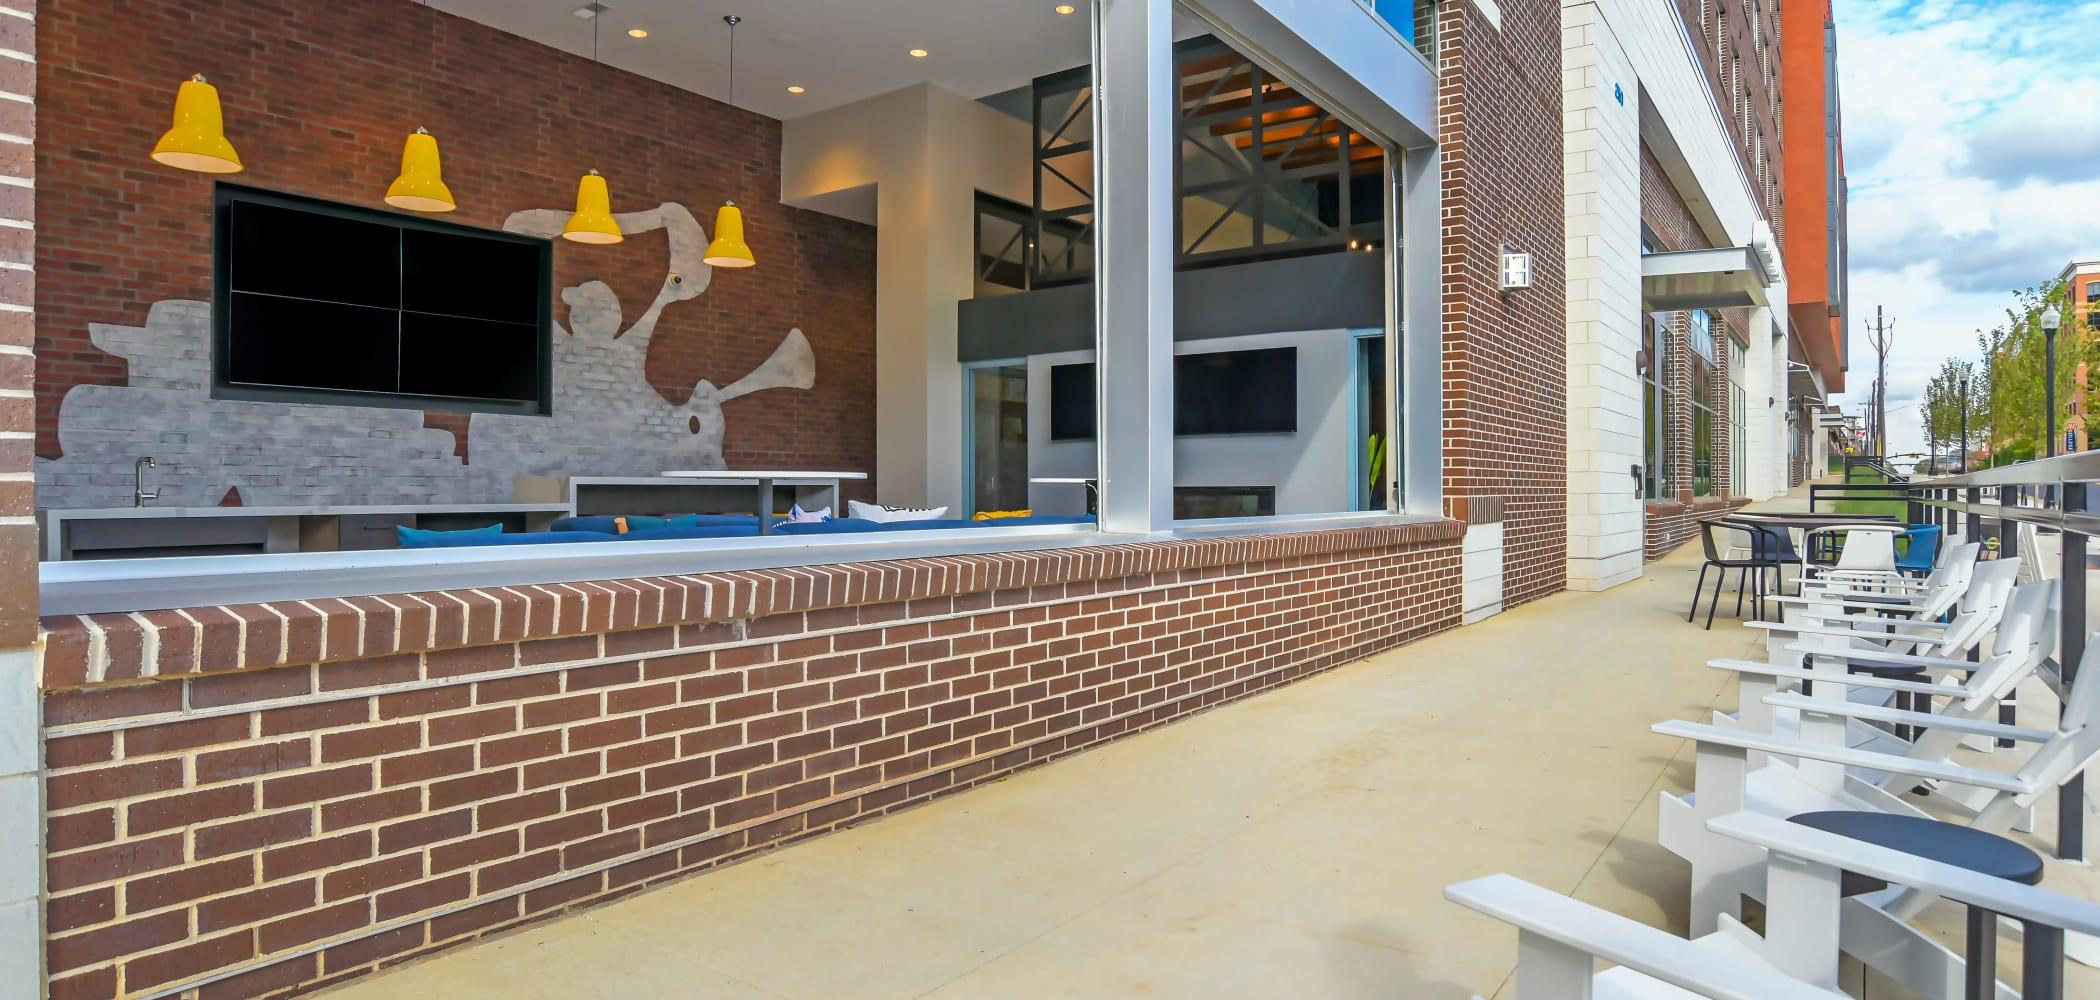 Exterior view of UNCOMMON Auburn in Auburn, Alabama